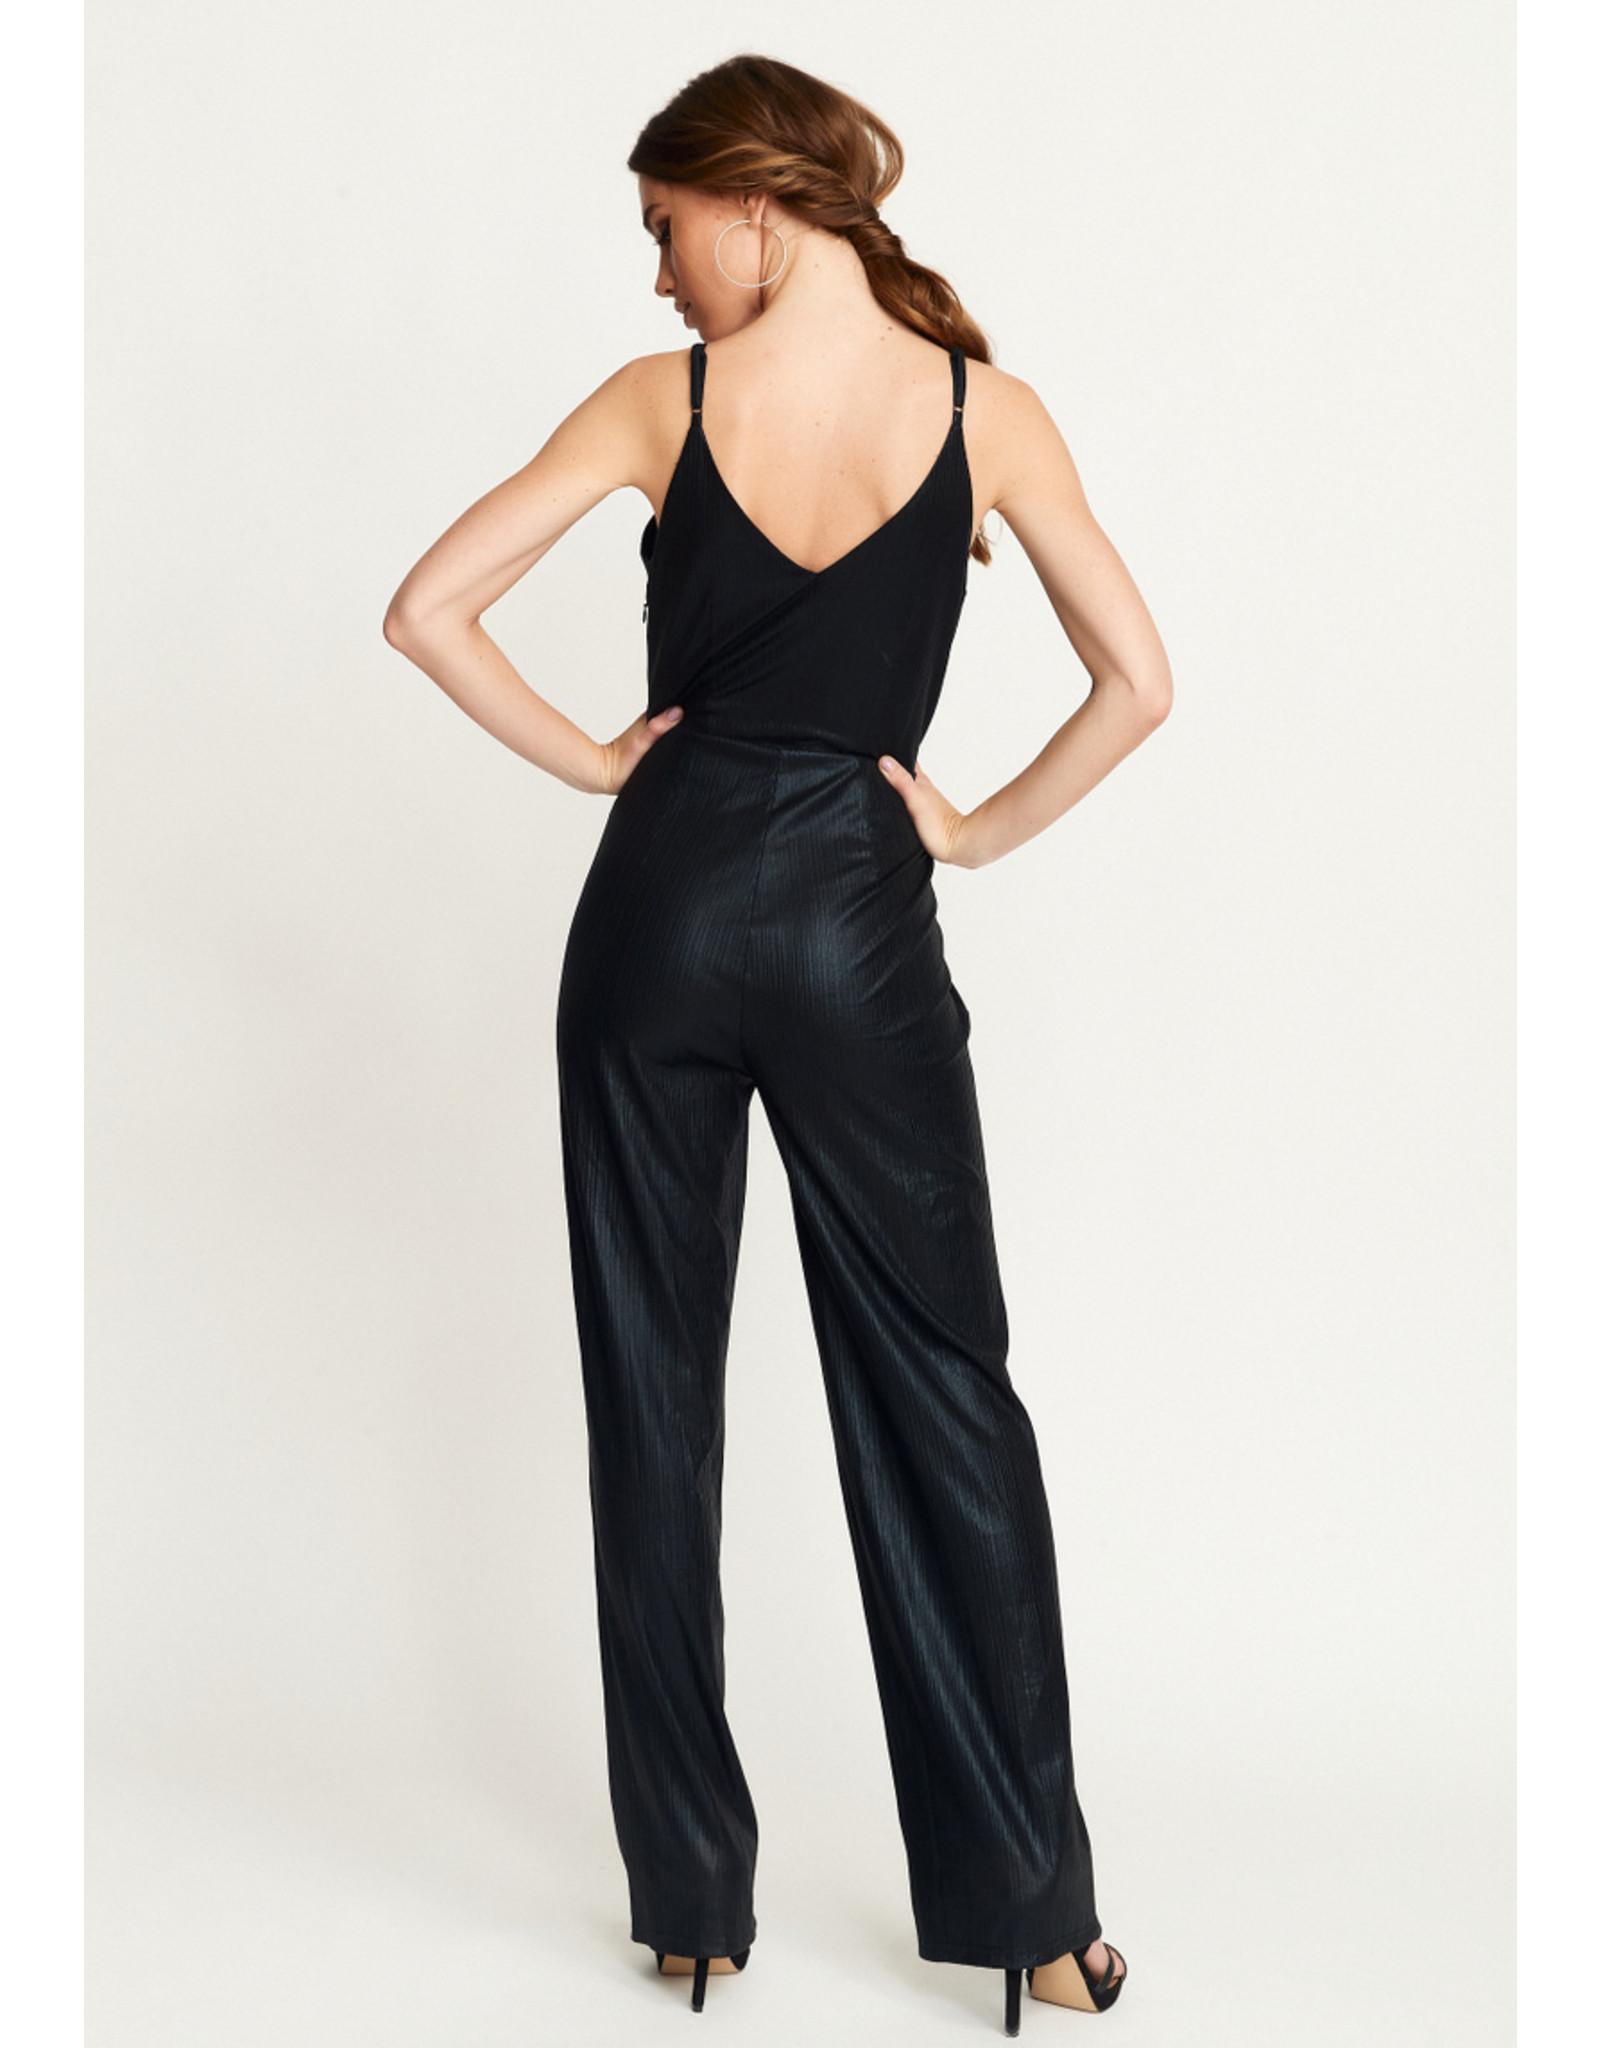 Rut & Circle Emilia Jumpsuit Black